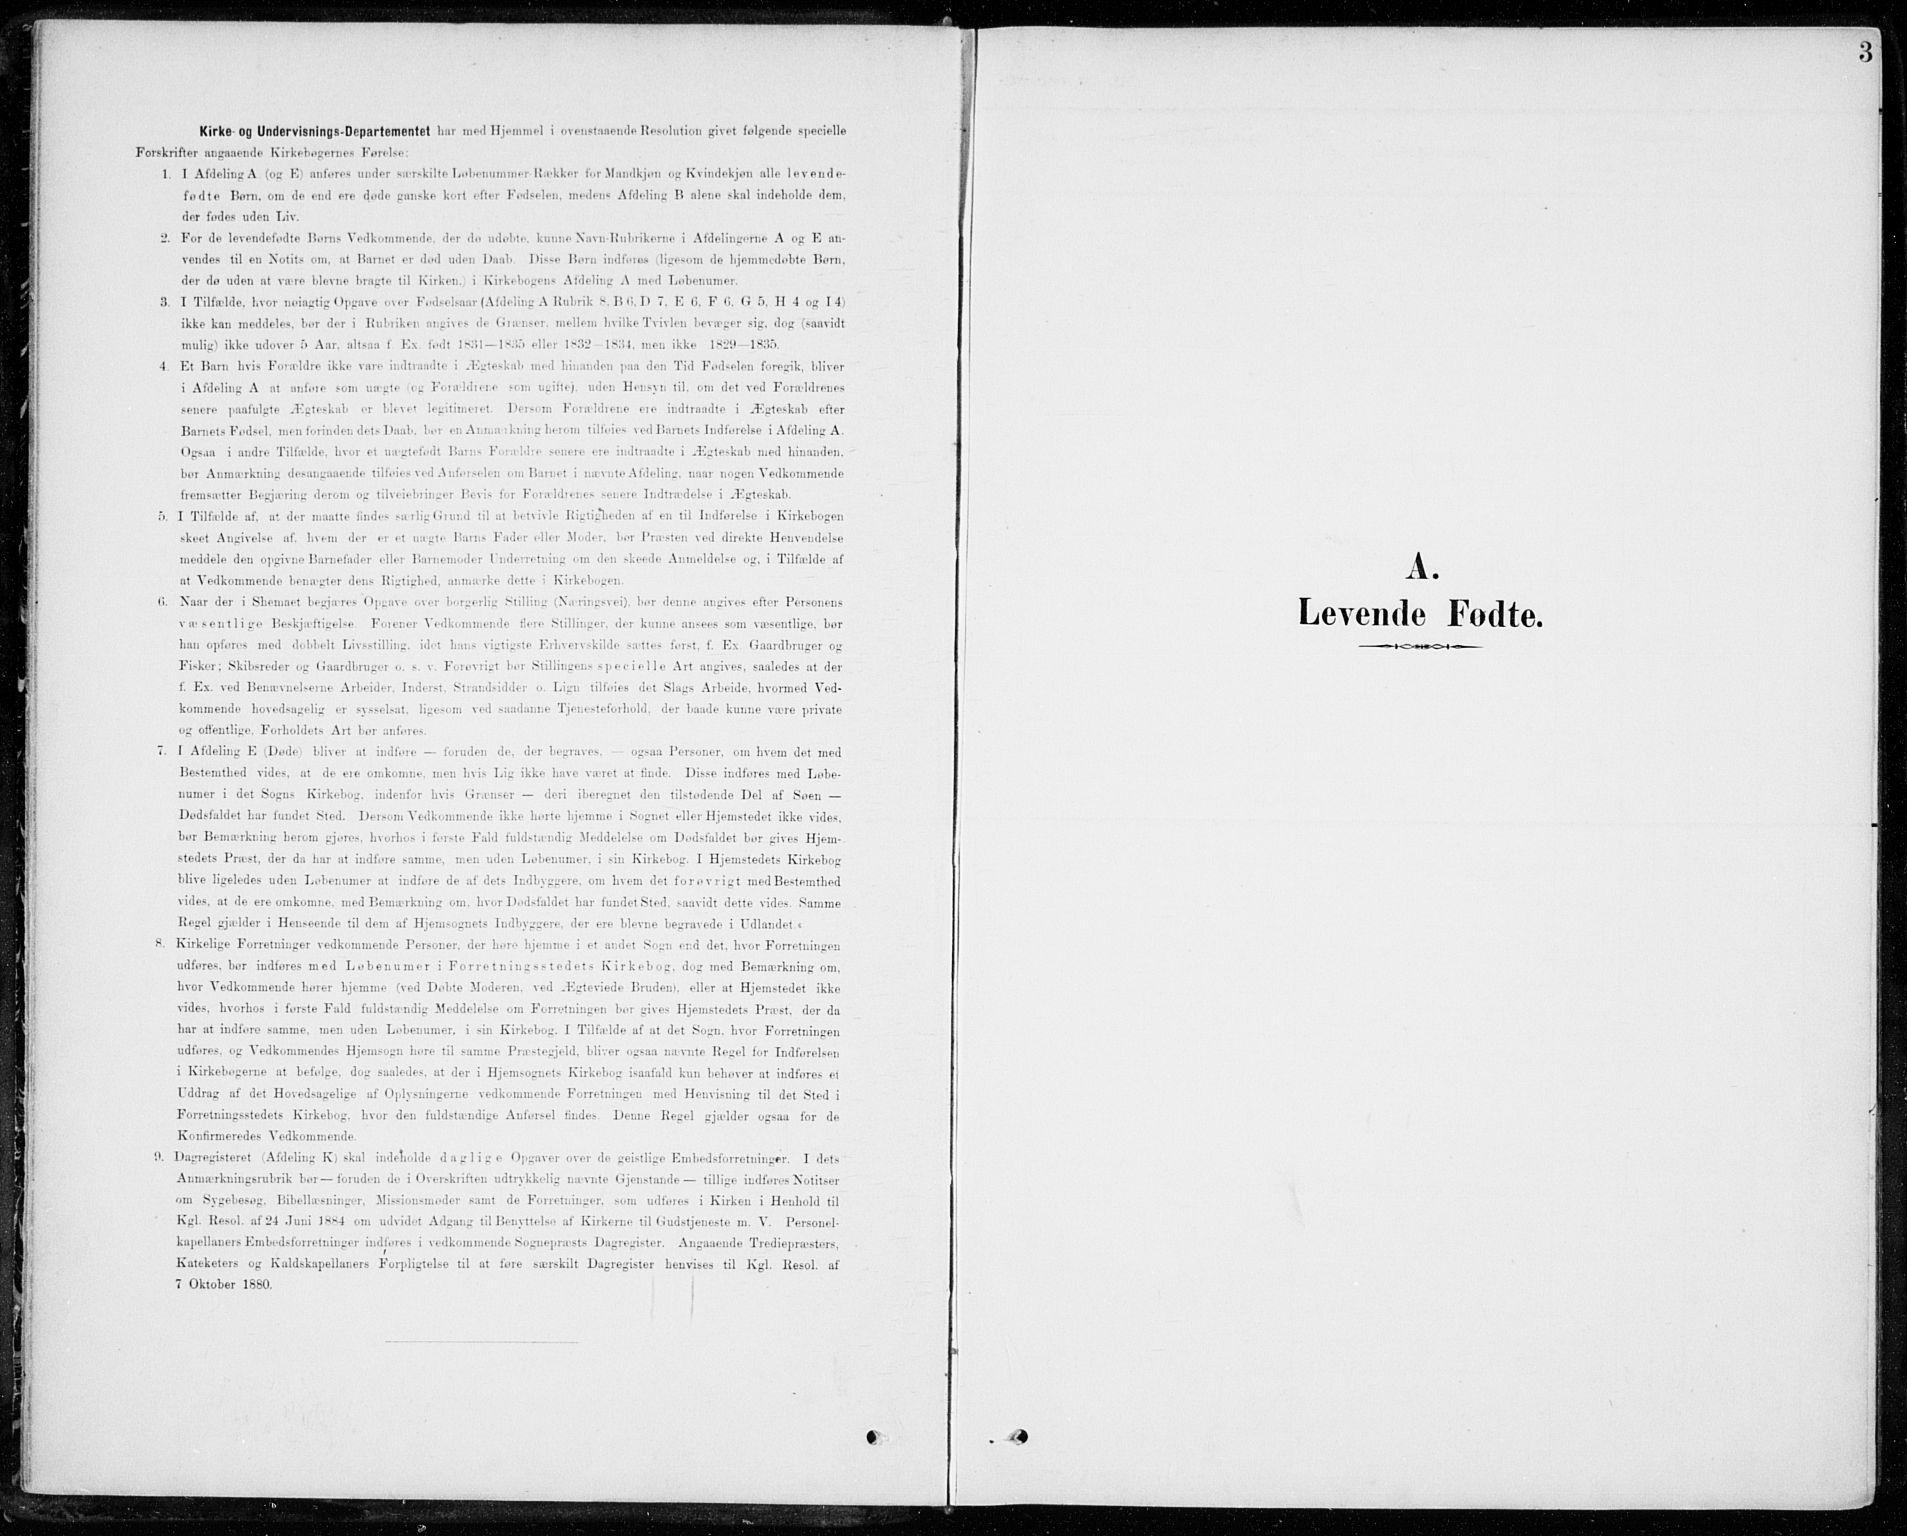 SAKO, Sigdal kirkebøker, F/Fc/L0002: Ministerialbok nr. III 2, 1894-1911, s. 3